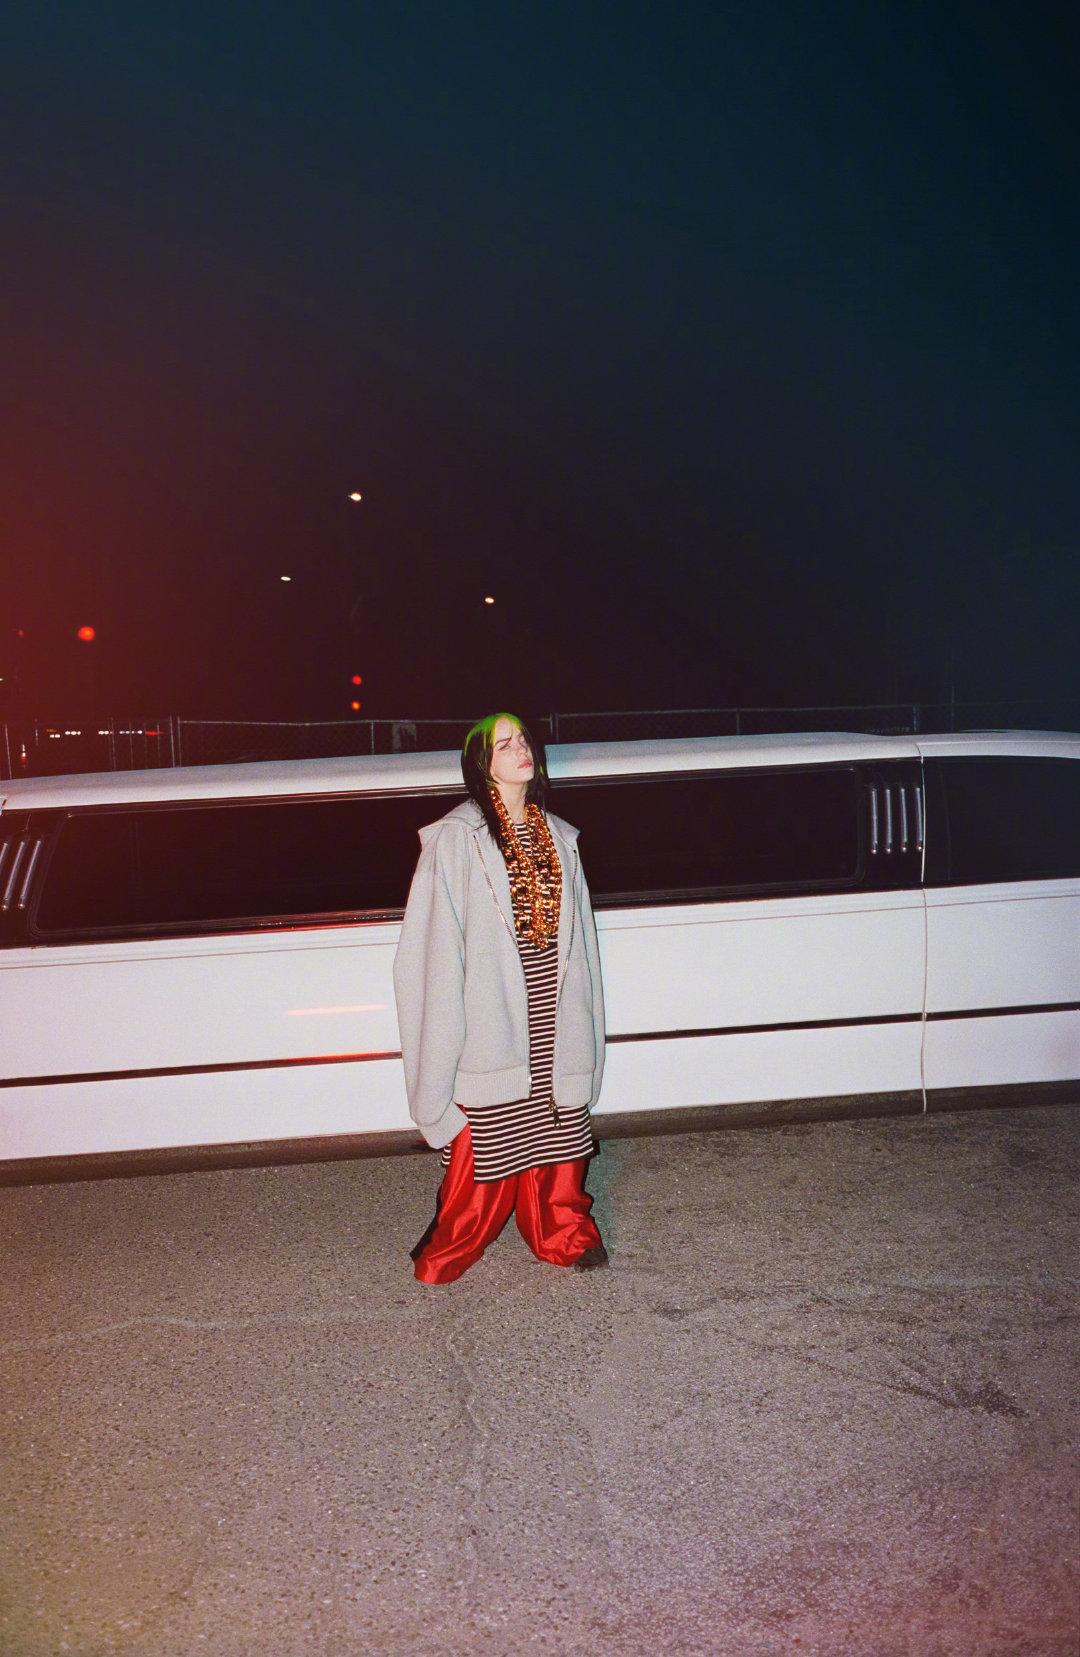 Billie Eilish Dazed 2020 3 - Фото: Билли Айлиш на обложке журнала Dazed